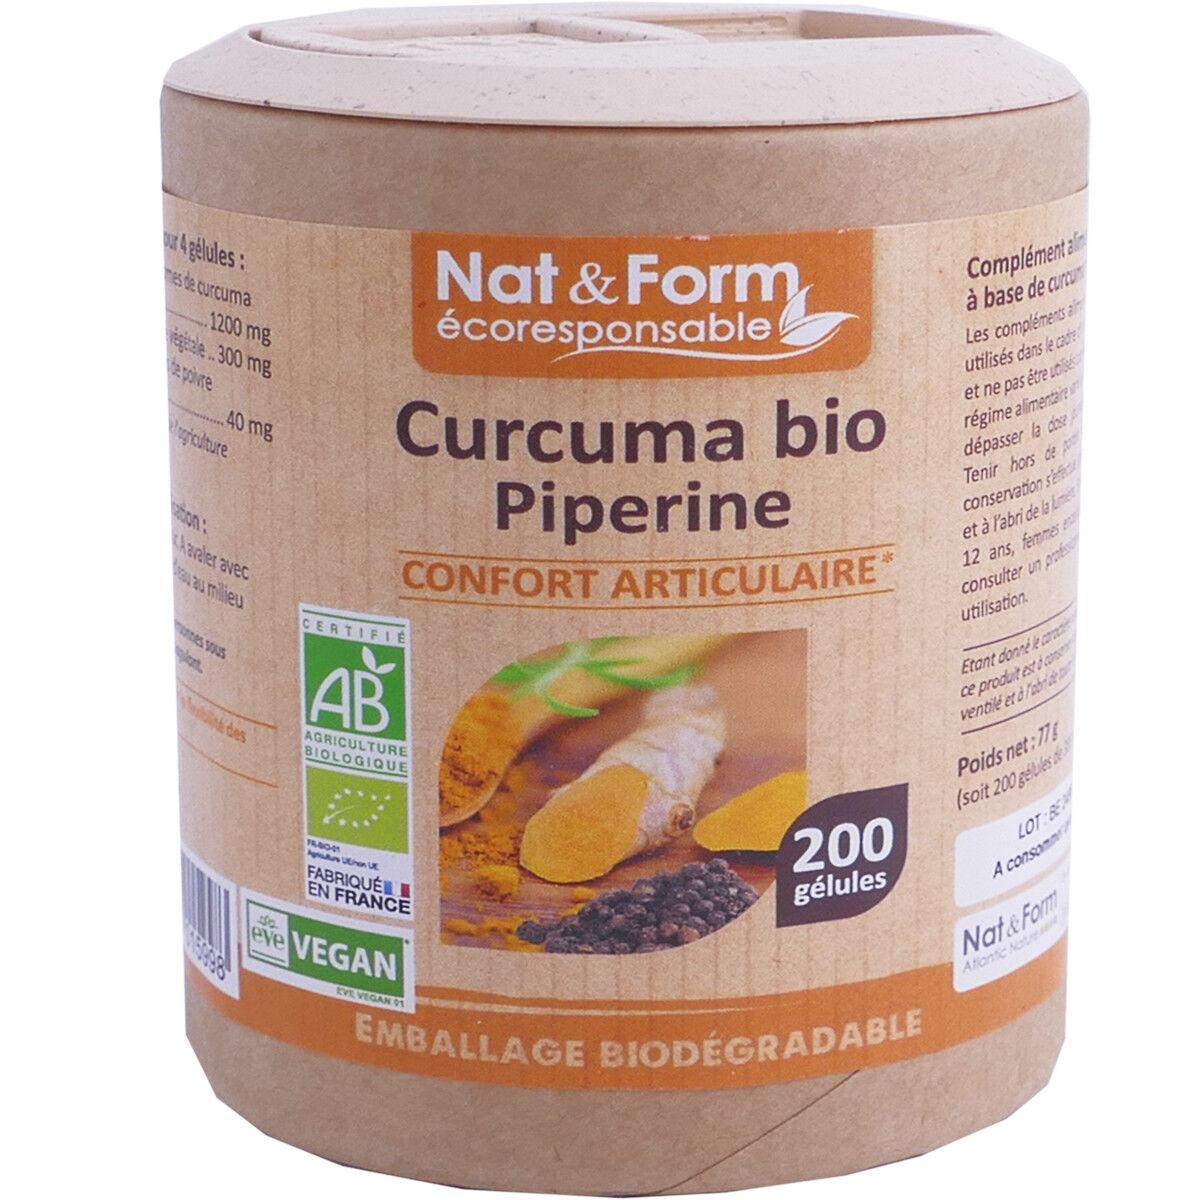 Nat & form curcuma bio piperine 200 gelules